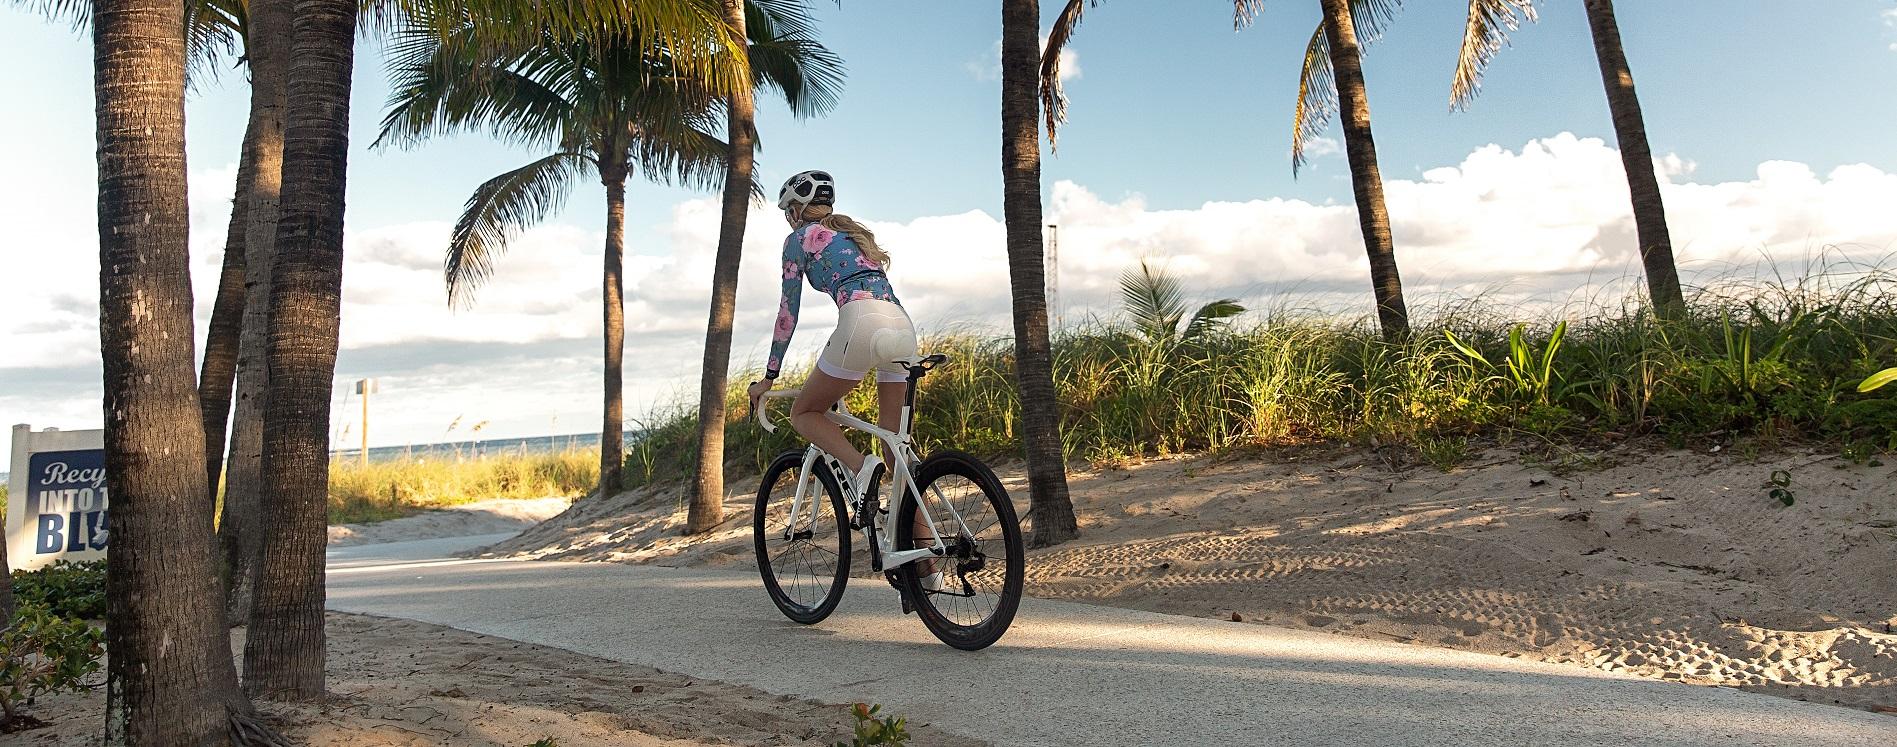 Nadezhda Pavlova riding bike on beach road in Florida